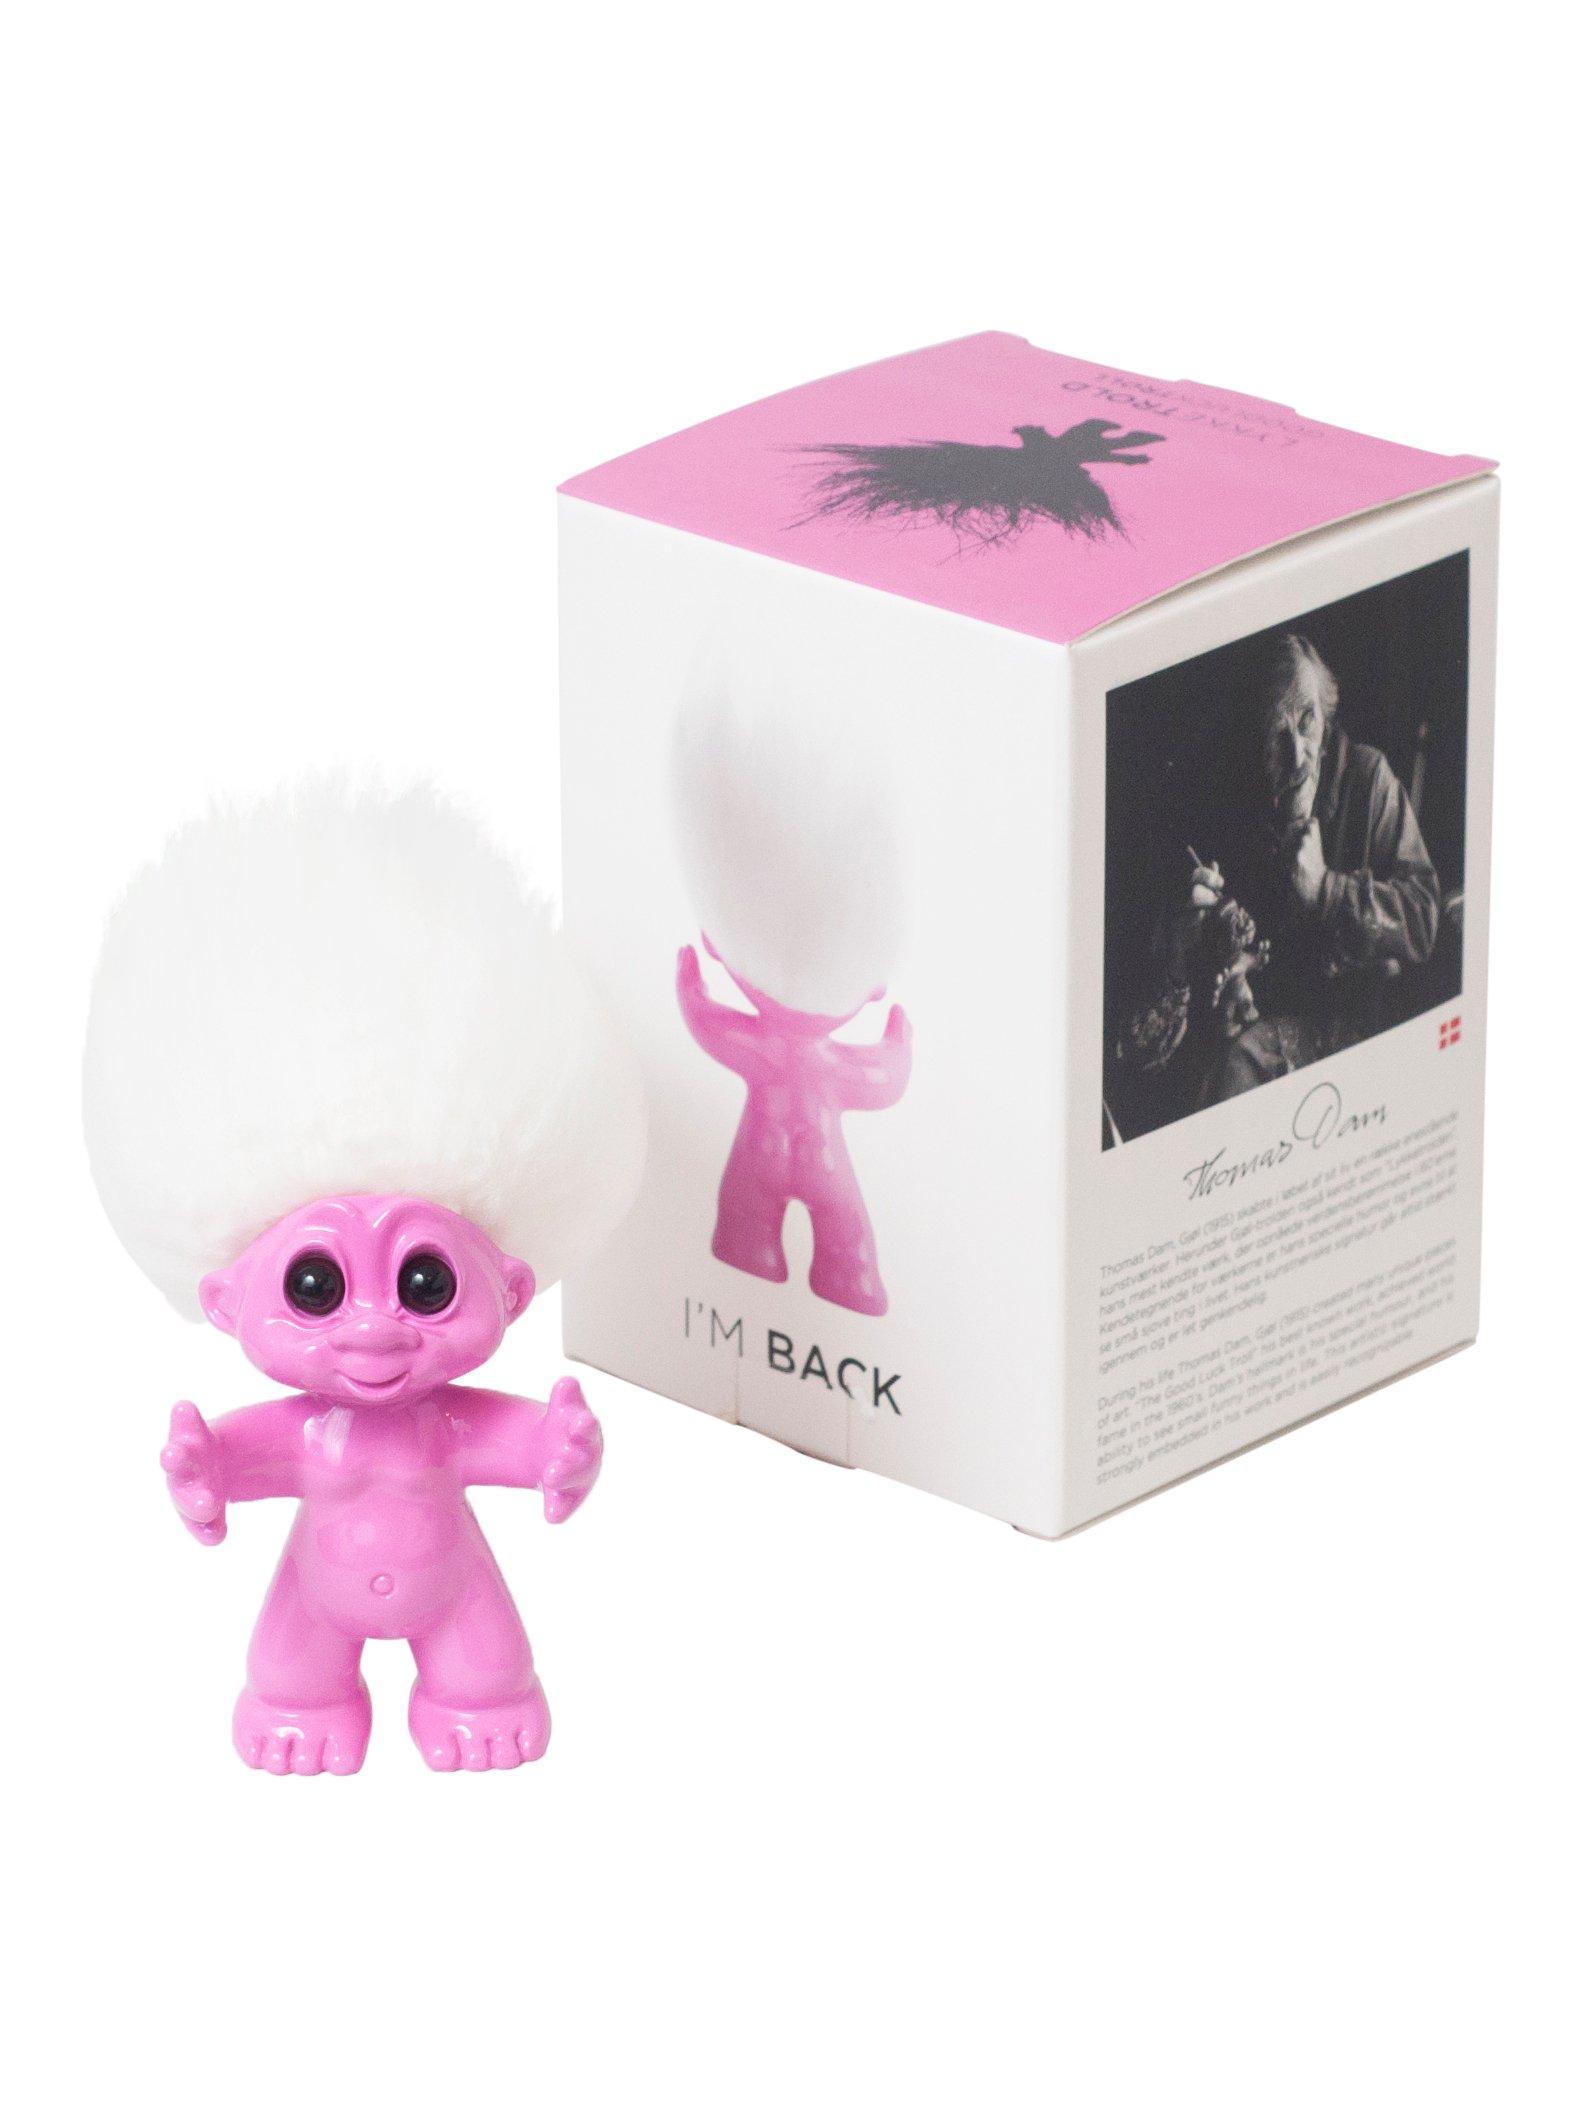 Good Luck Troll - Gjøl Trold 9 cm. - Pink (92863)